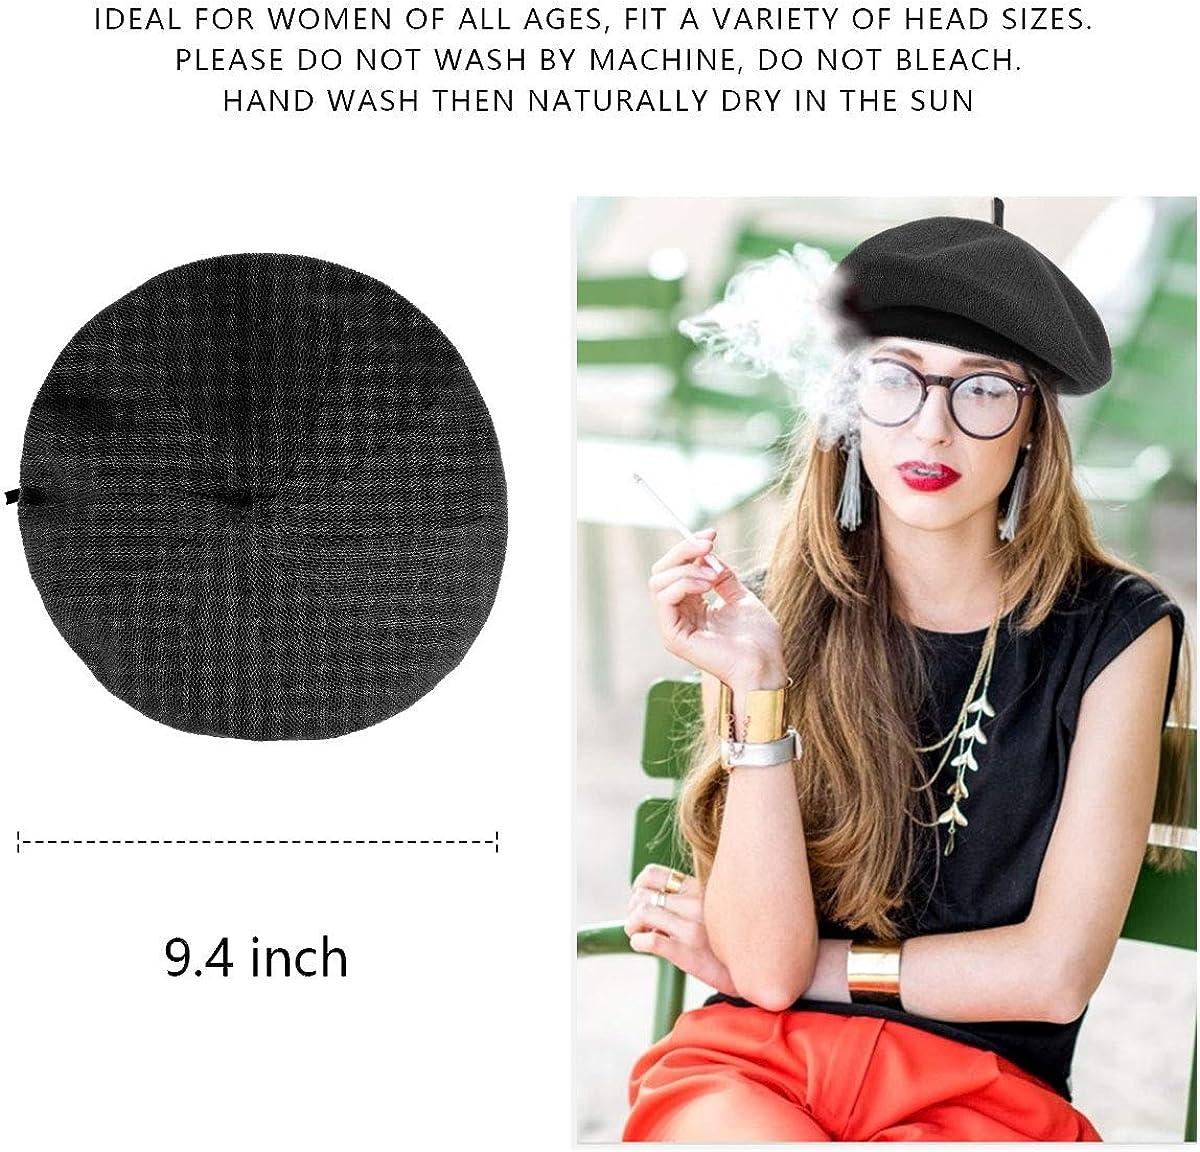 Unisex PU Artist Hat 1940s Vintage Classic French Beret Hat Adjustable Pumpkin Knit Hat Beanie Cap Black BLURBE Women Beret Hats